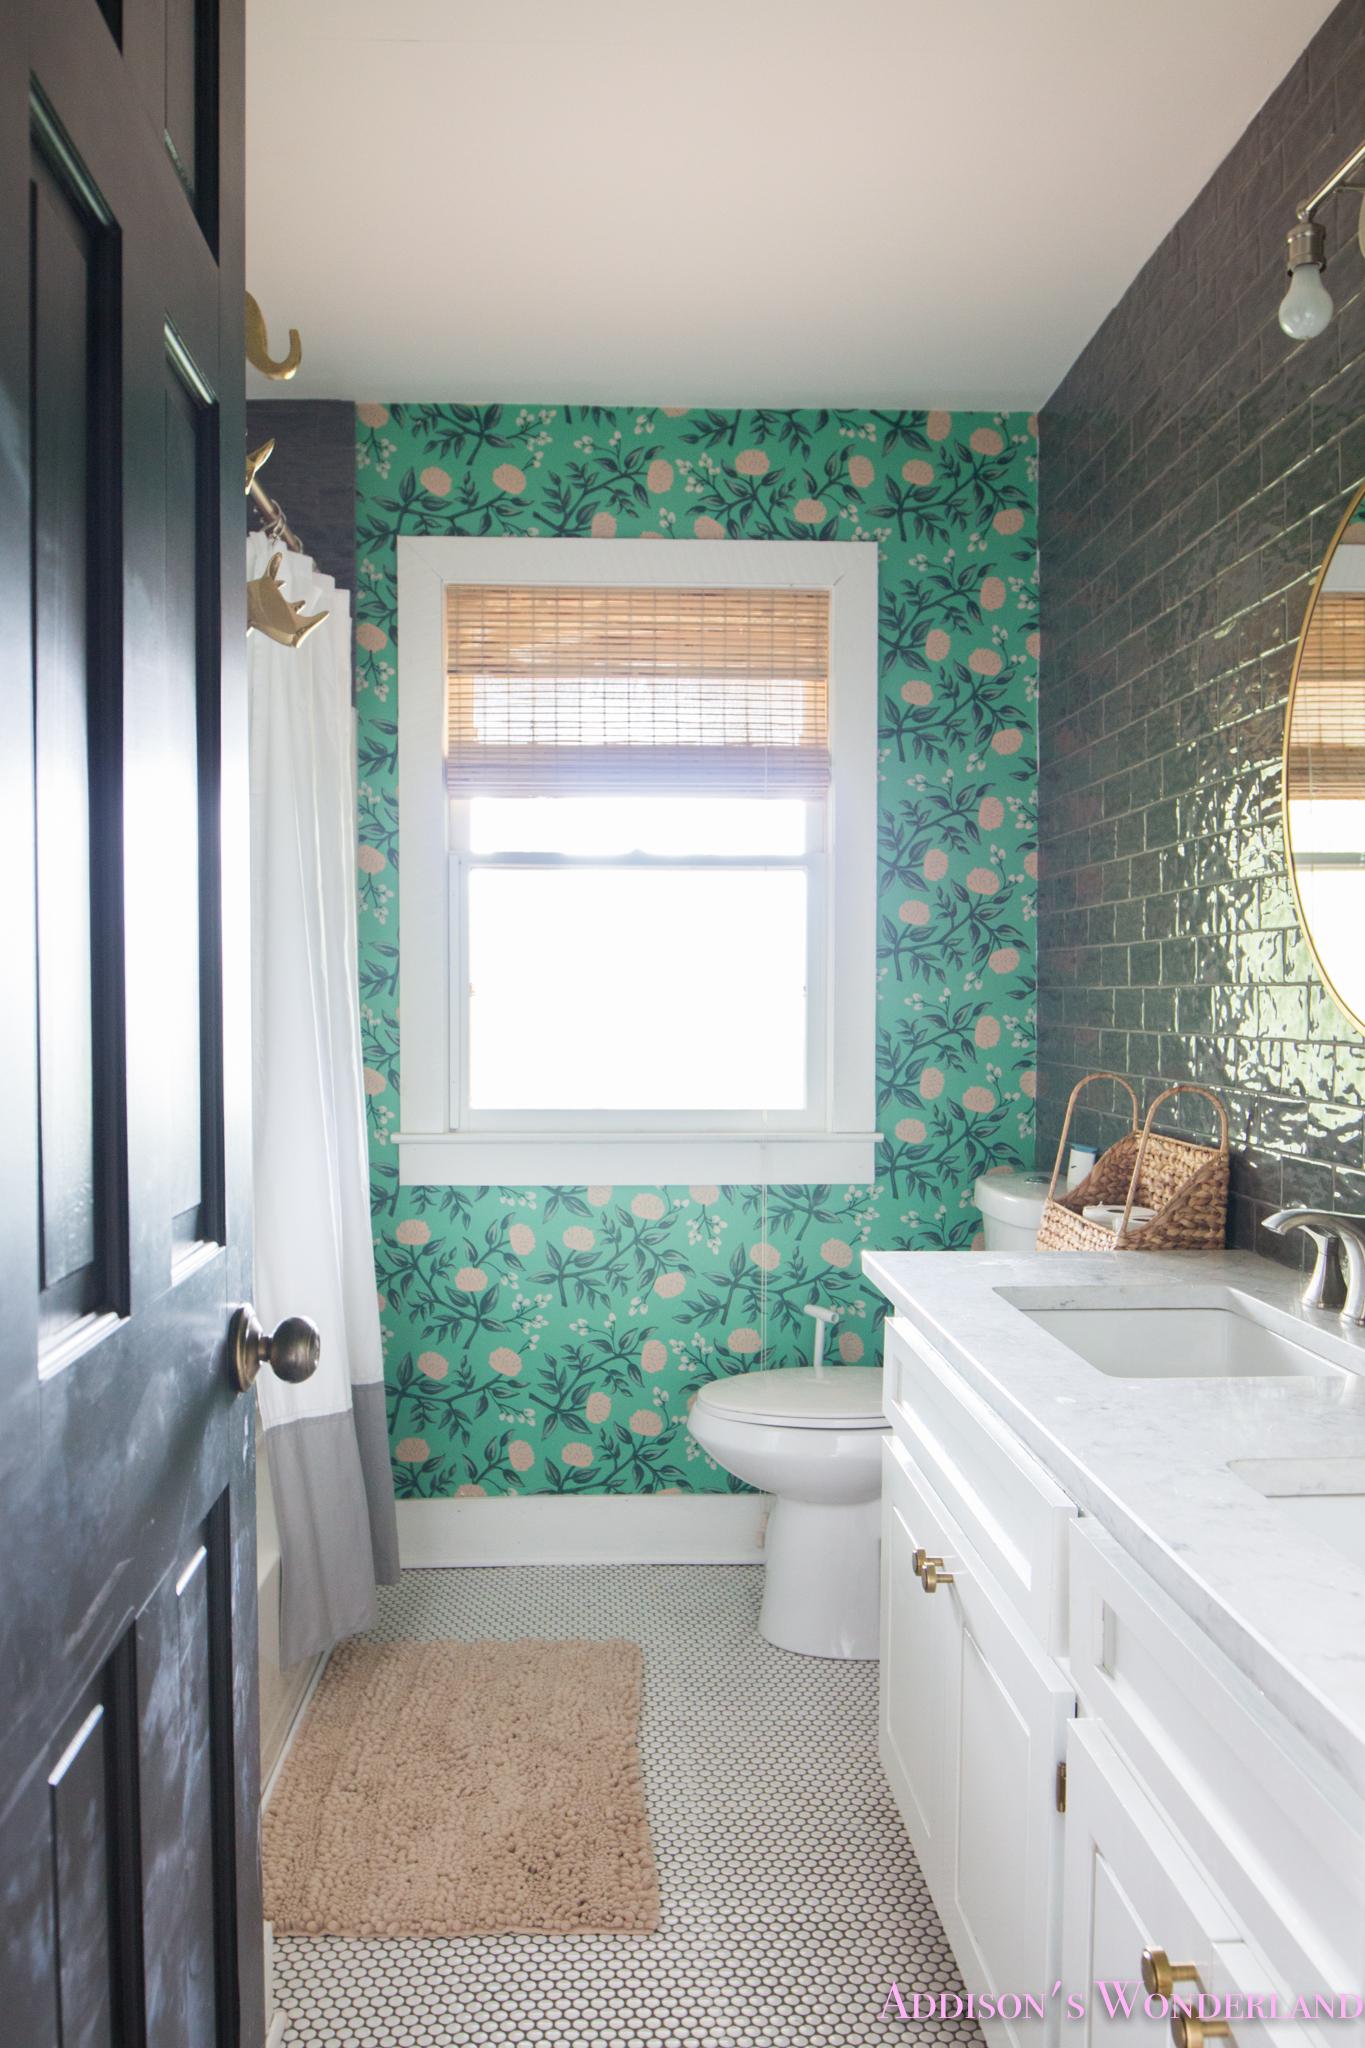 Bathrooms Archives - Addison\'s Wonderland